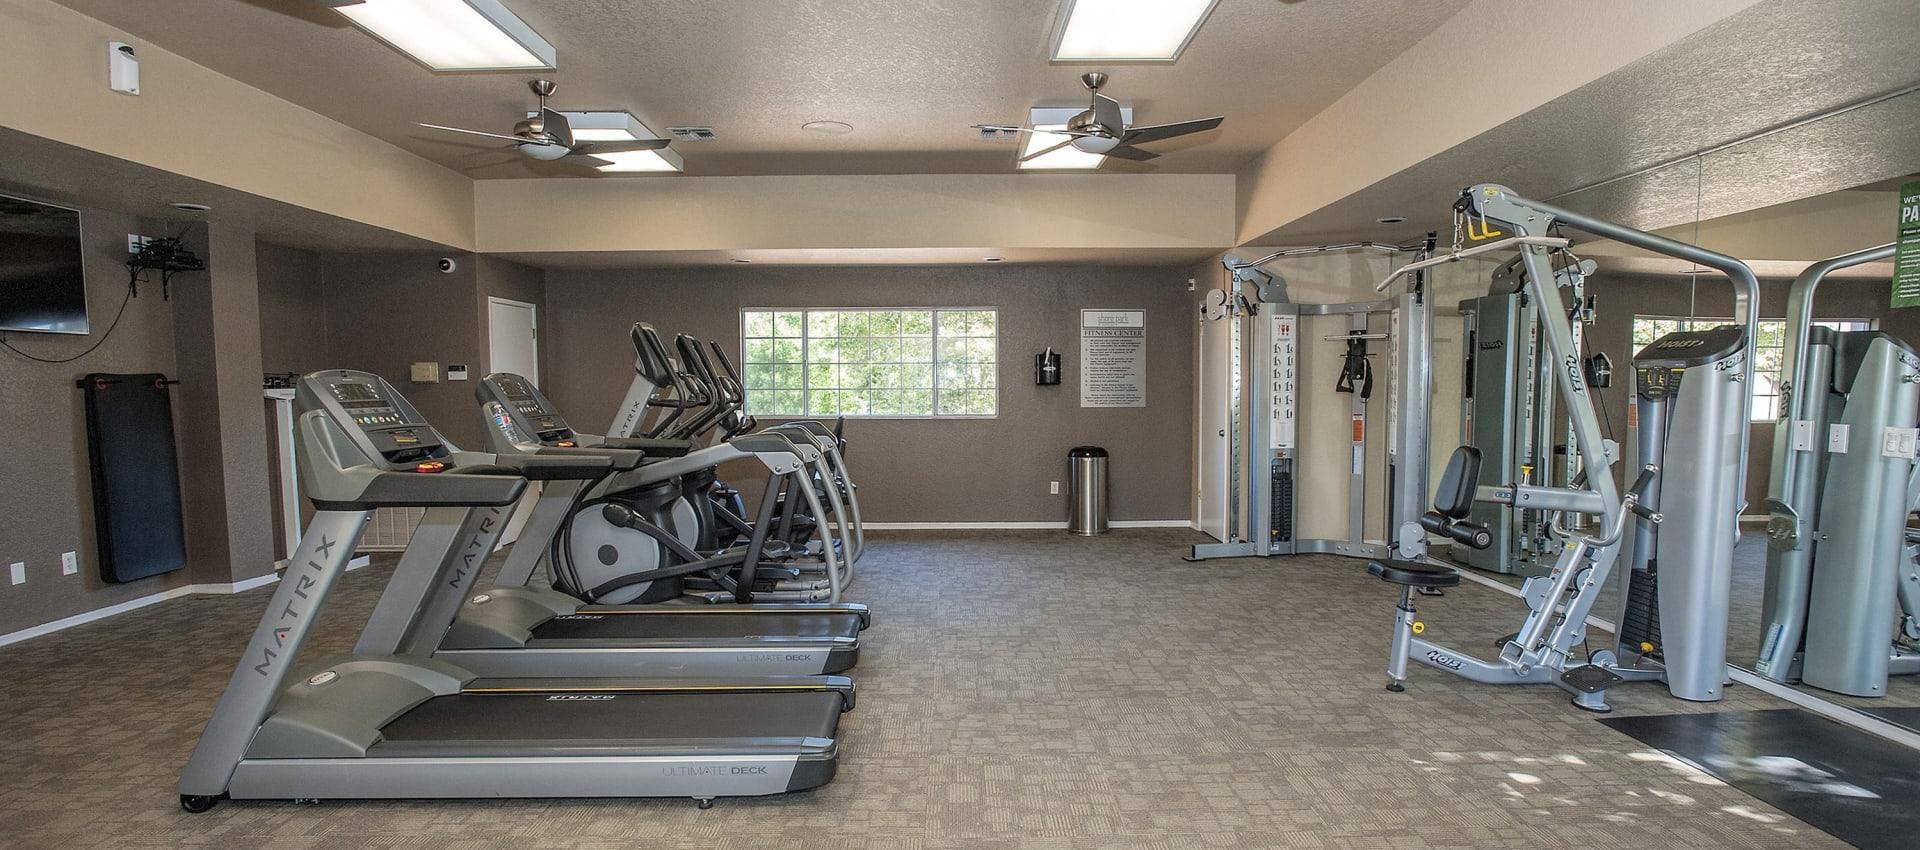 Fitness center at Shore Park at Riverlake in Sacramento, California